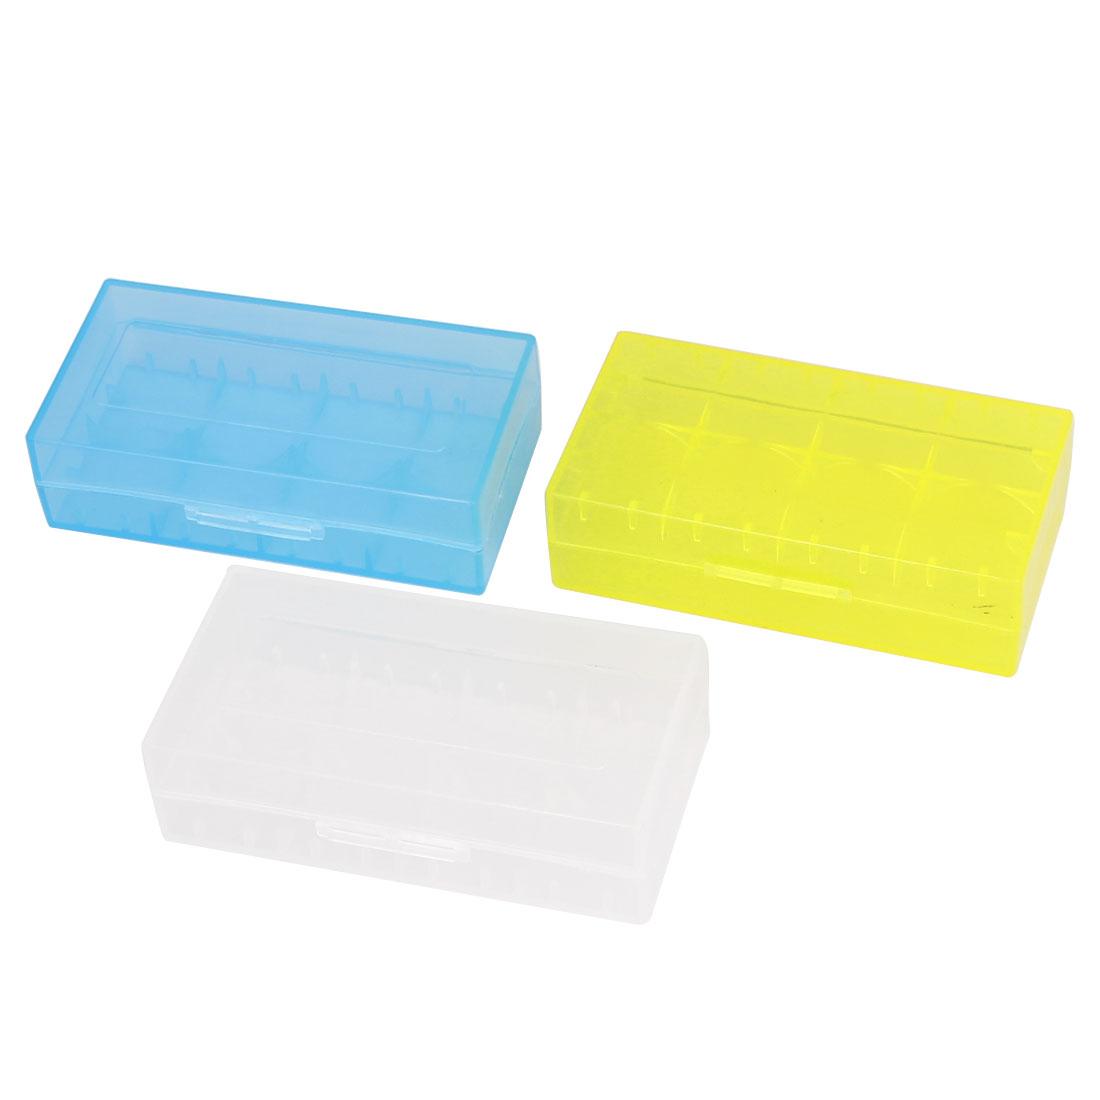 Multicolor Storage Box Case Container 3Pcs for 4 x CR123A Batteries